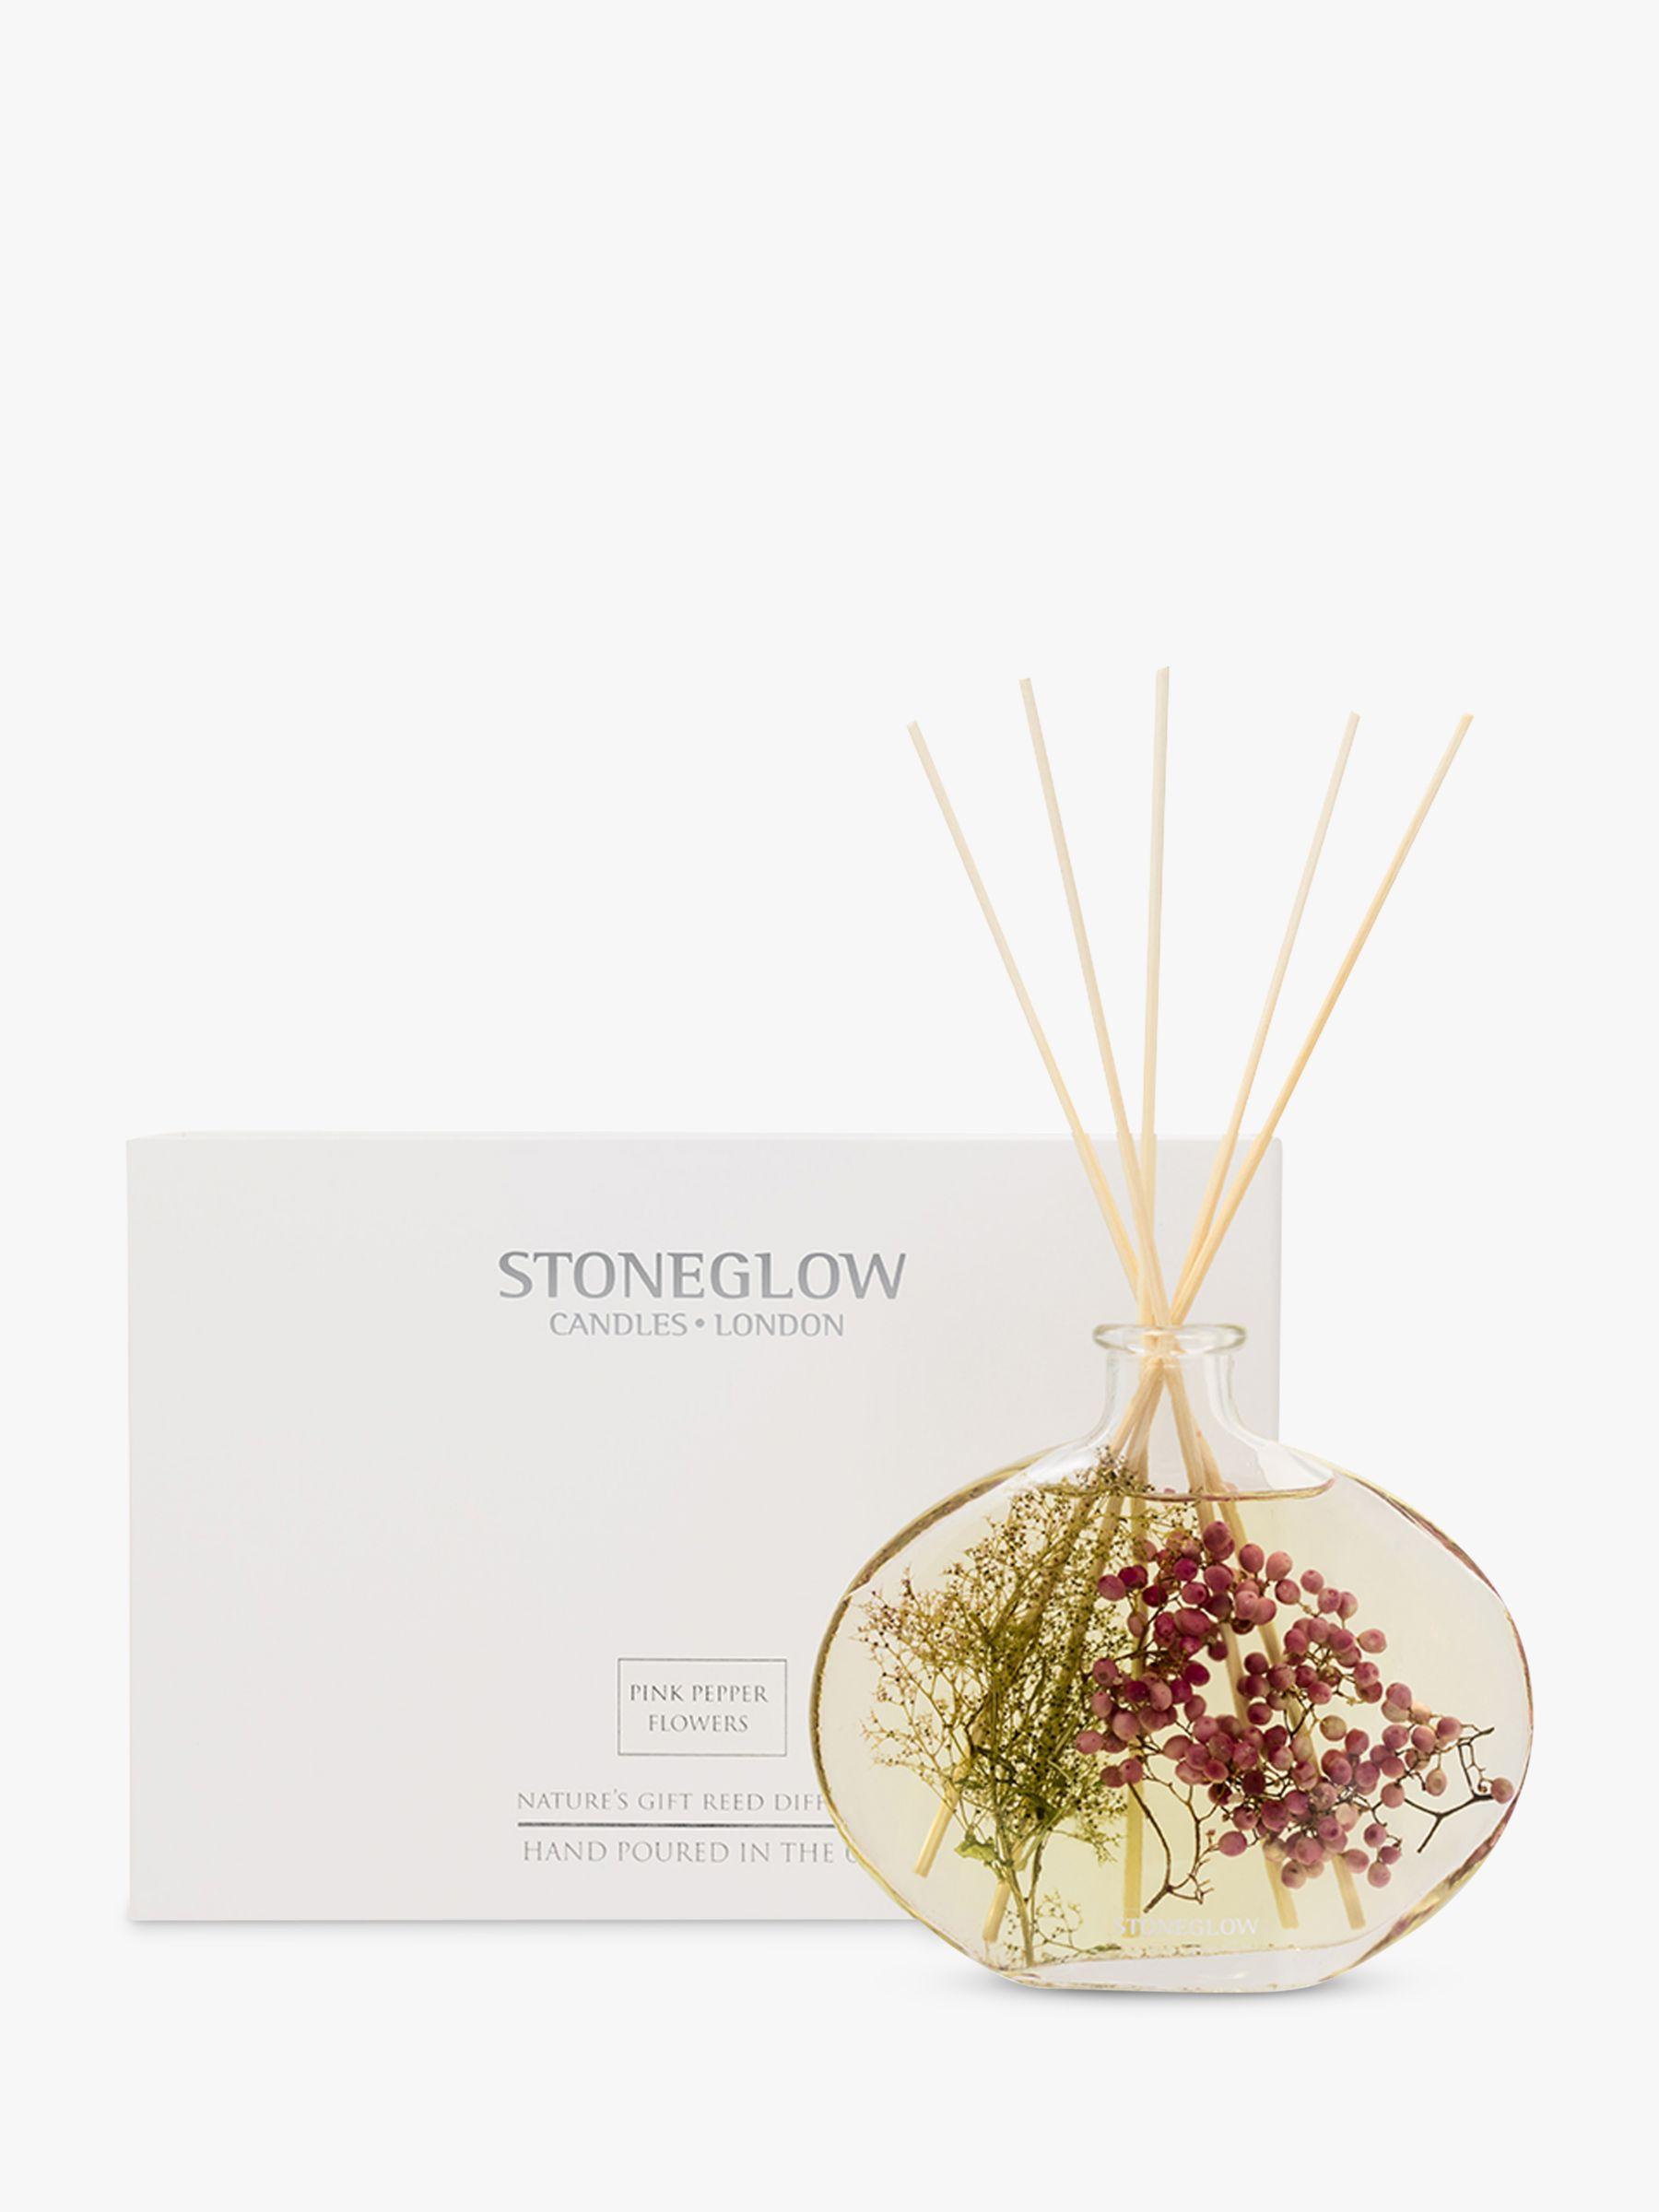 Stoneglow Stoneglow Pink Peppercorn Diffuser, 200ml